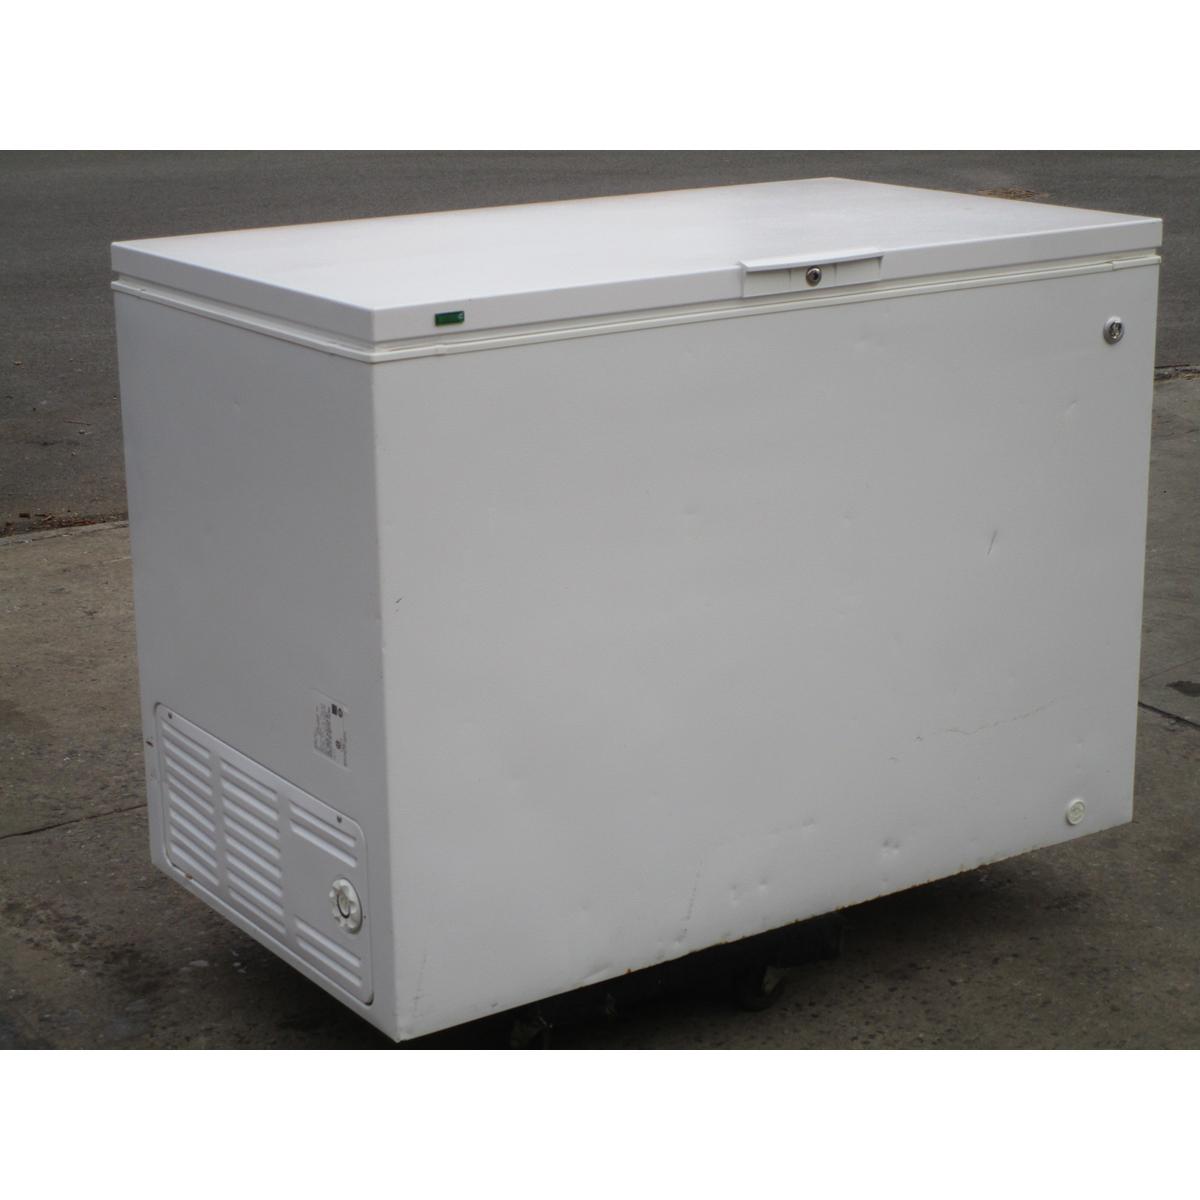 Ge Fcm15pubww Chest Freezer 14 8 Cu  Ft   Used Great